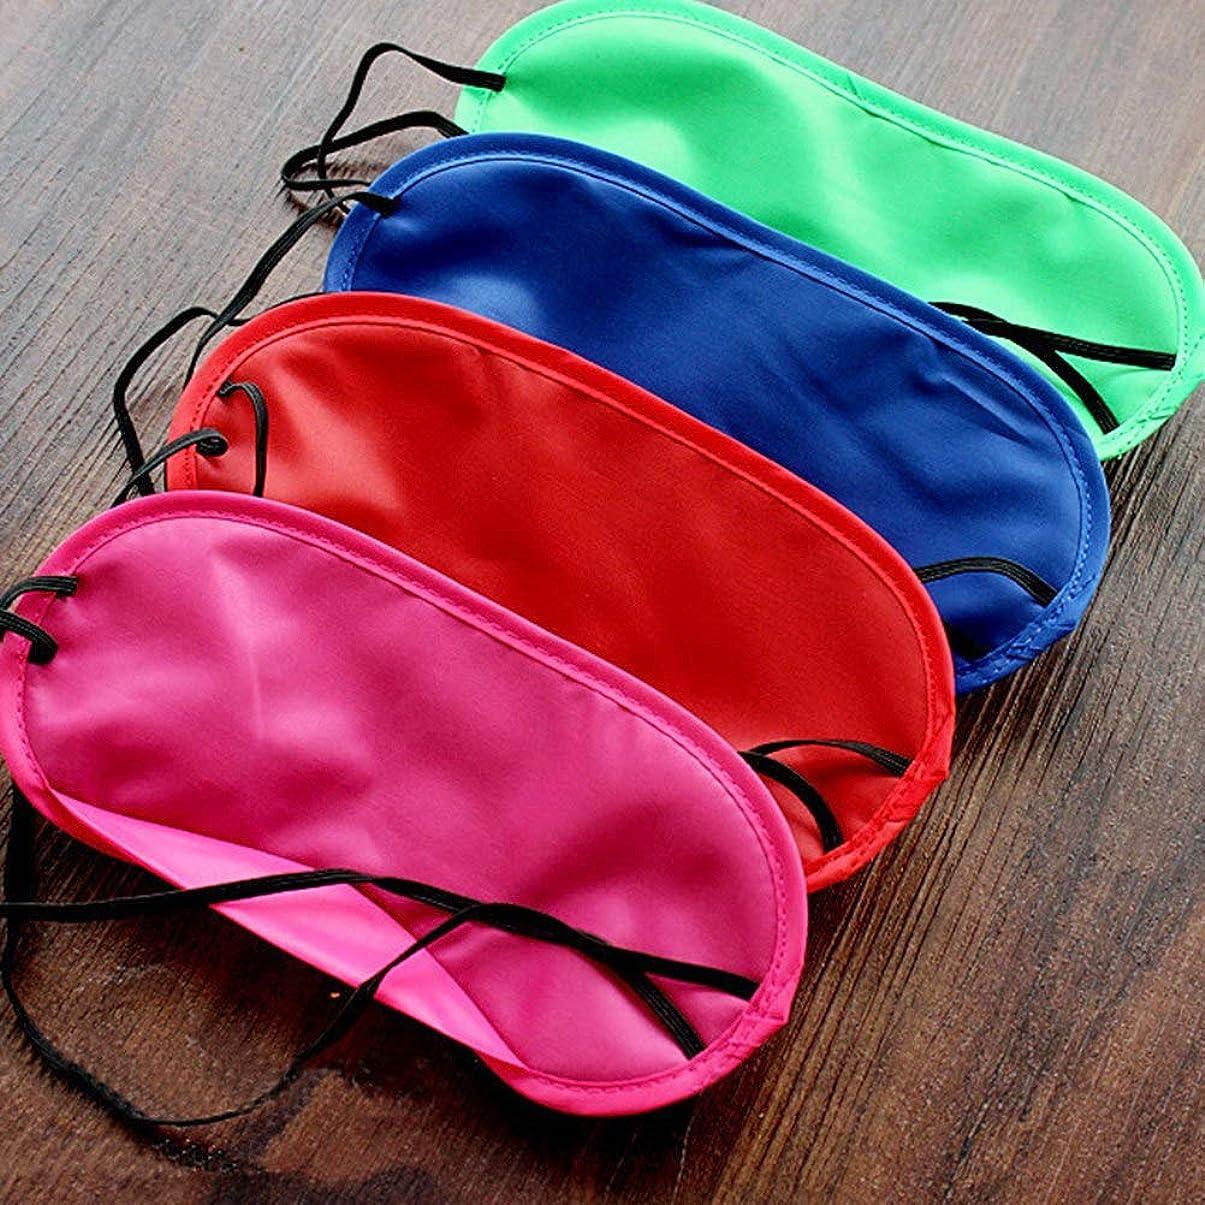 NOTE 12ピース多色アイマスクカバー軽量アイシェード目隠し睡眠マスク弾性ストラップ用キッズ女性男性